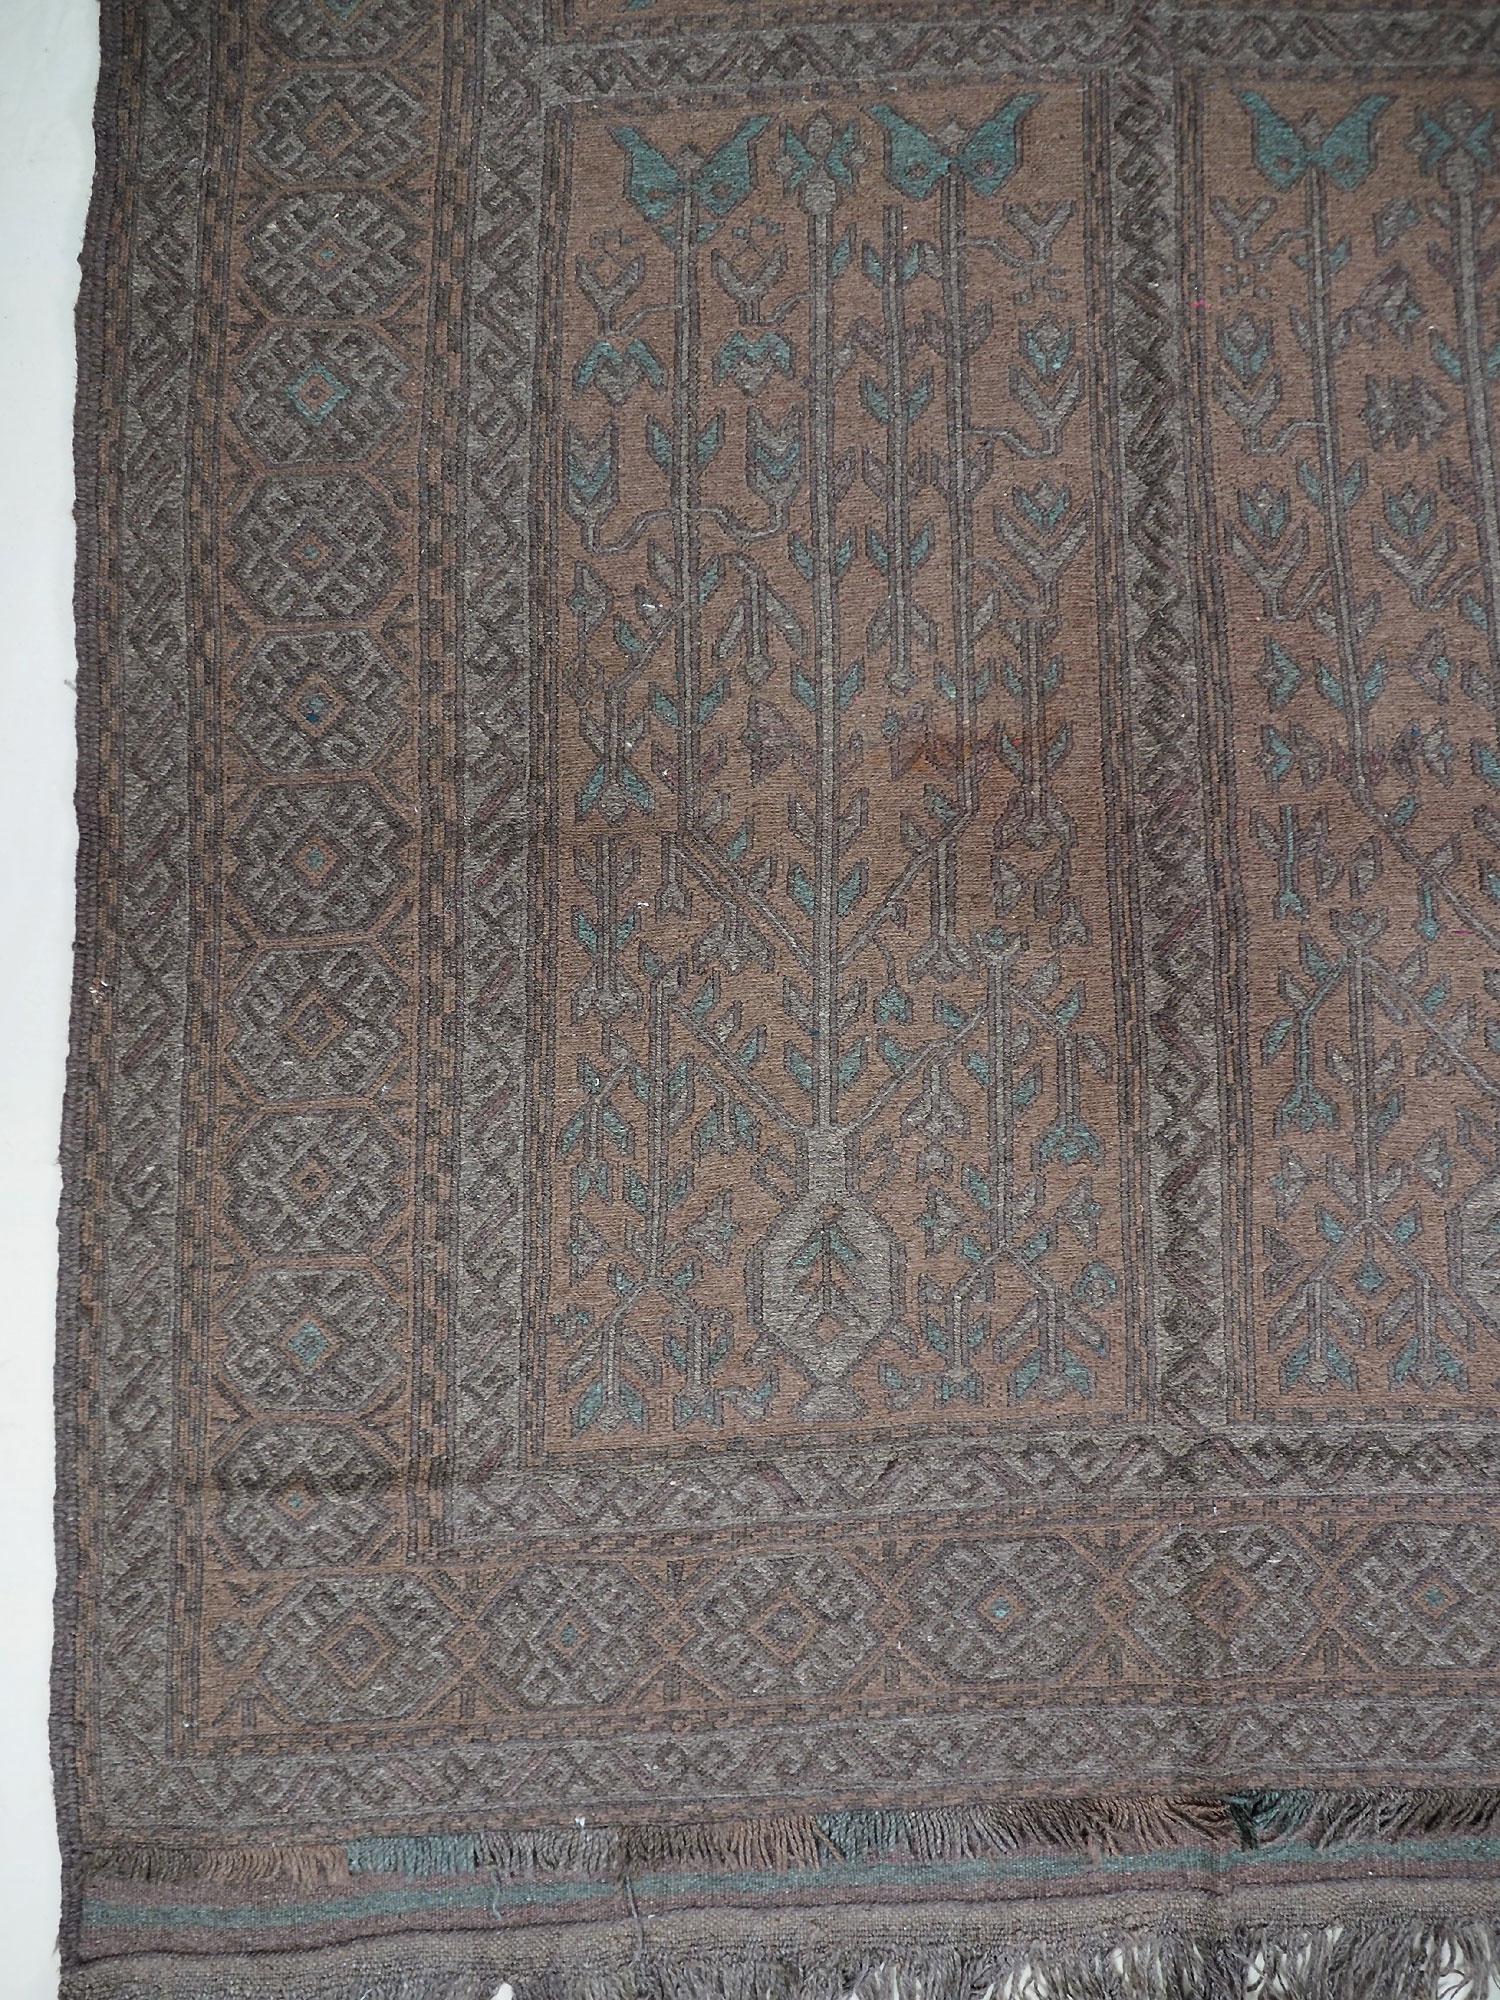 295x175 cm  sumakh kelim Taimani Balouch Süd-Afghanistan Nr-TM-4